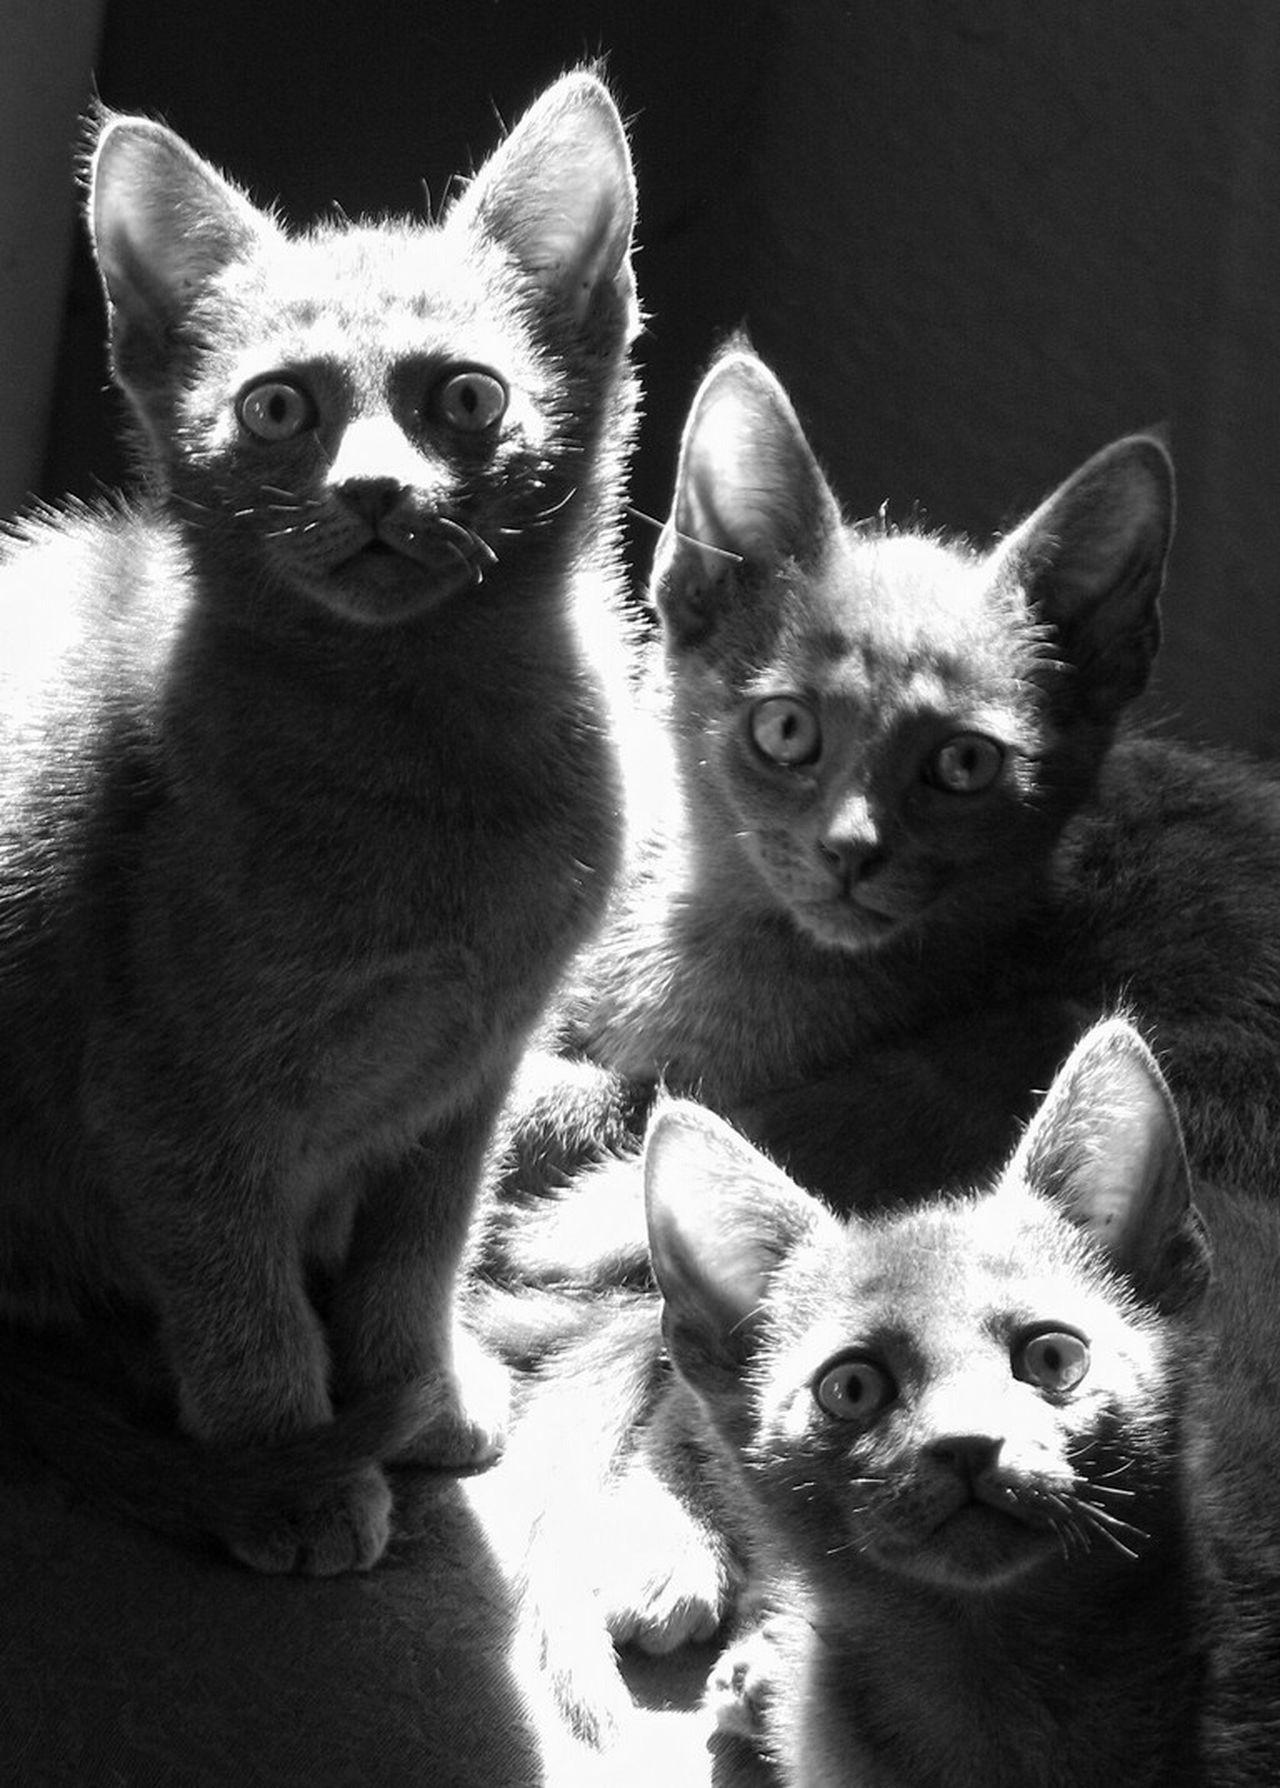 Perfect Match Three grey cats Cats Grey Cats Shades Of Grey Cats Of EyeEm My Cats Love Cats